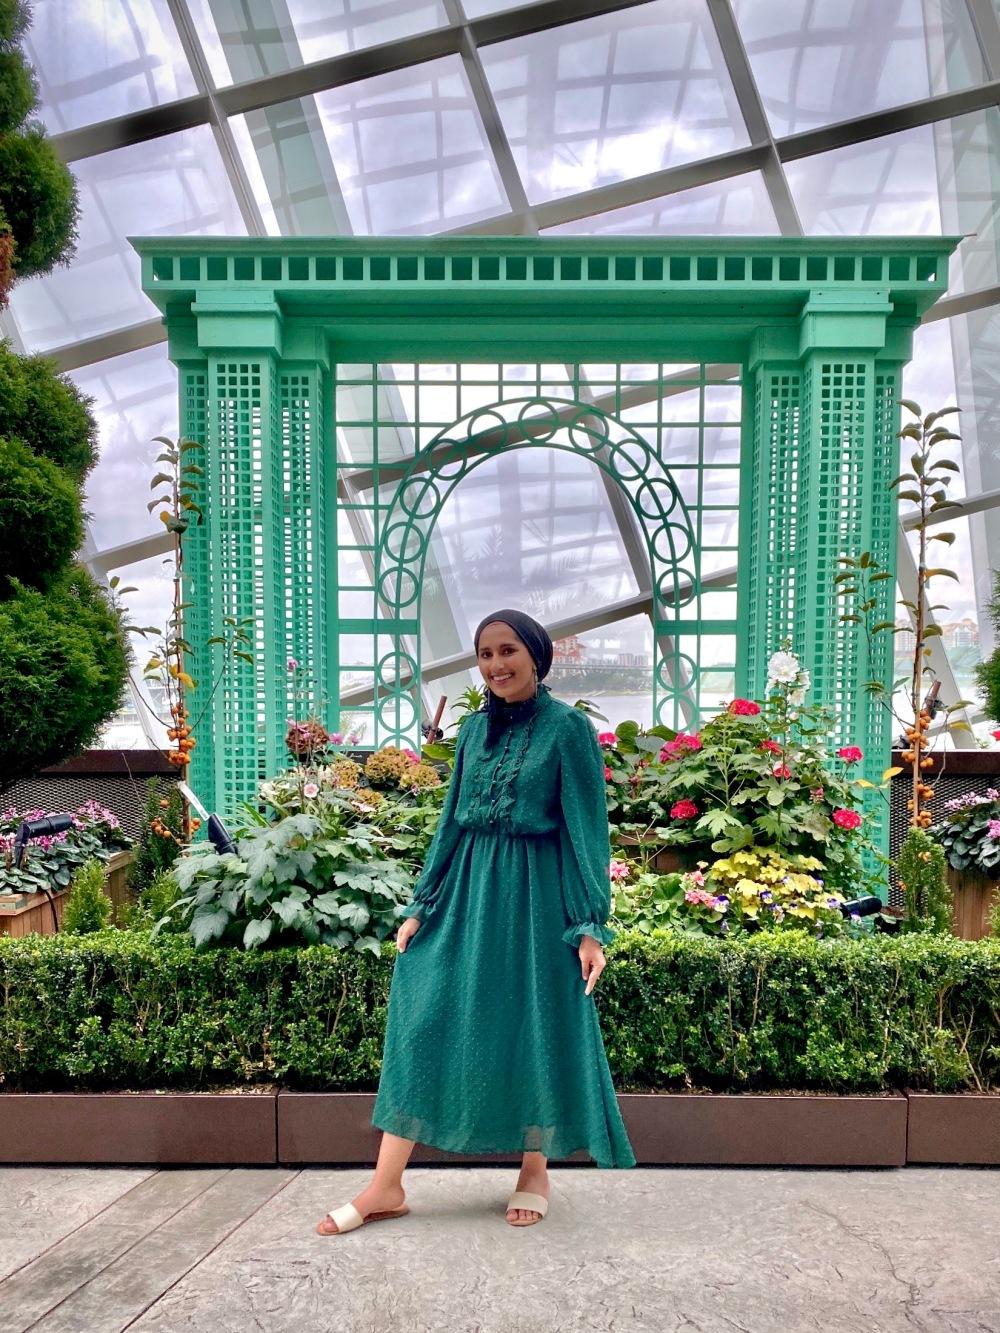 Rafa Farihah in an Emerald Green Dress at Flower Dome Singapore